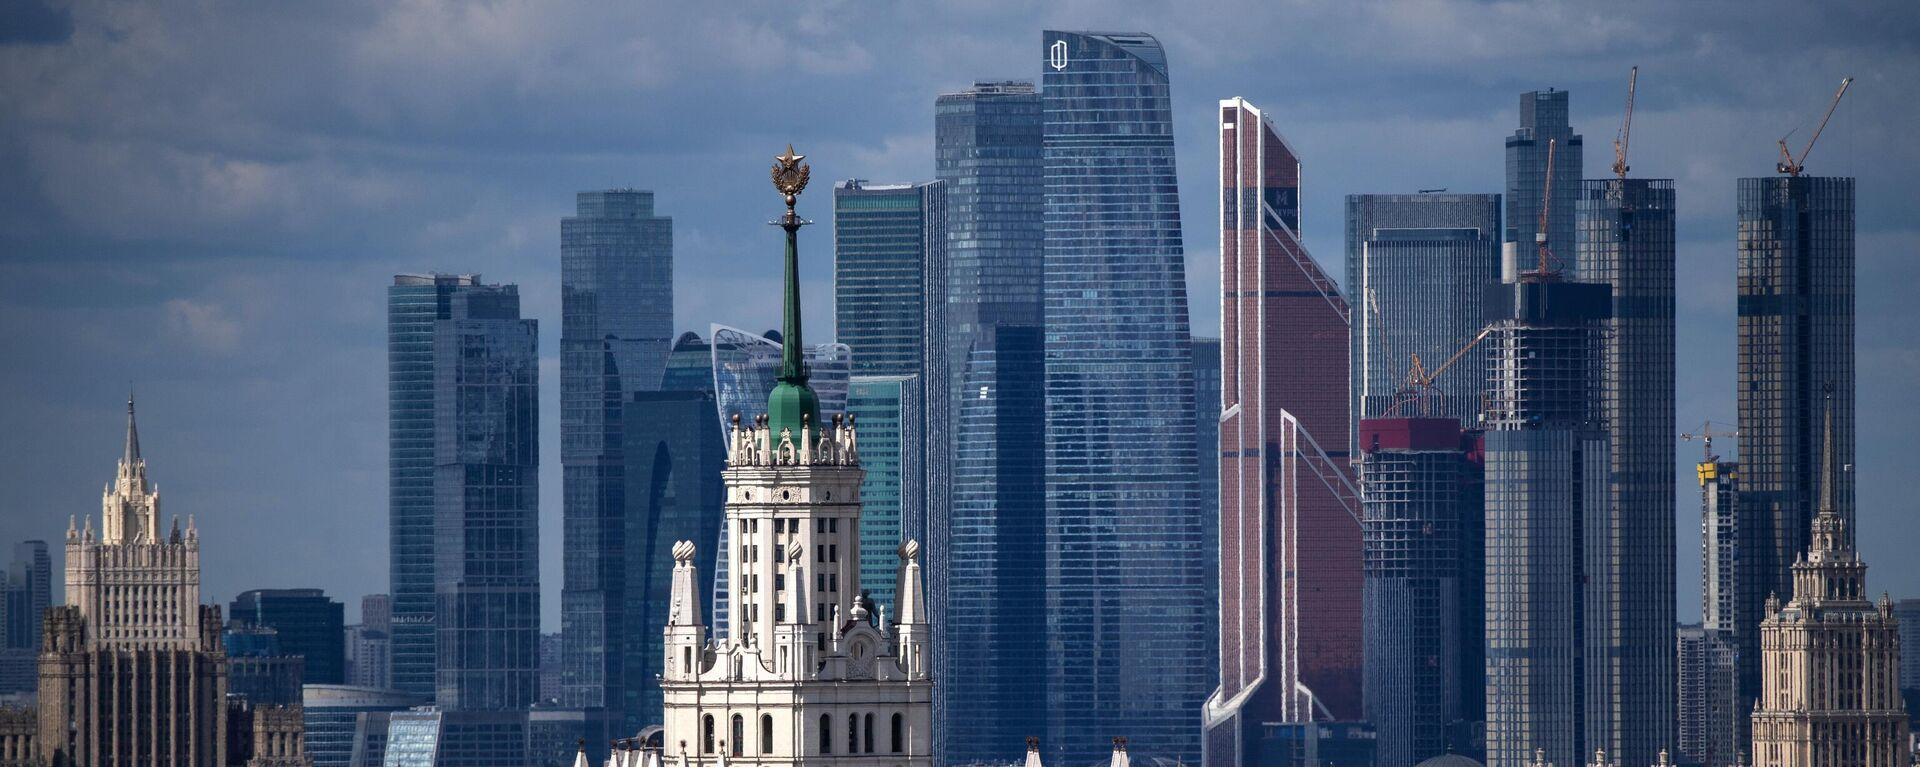 Russlands Außenministerium - SNA, 1920, 22.09.2021